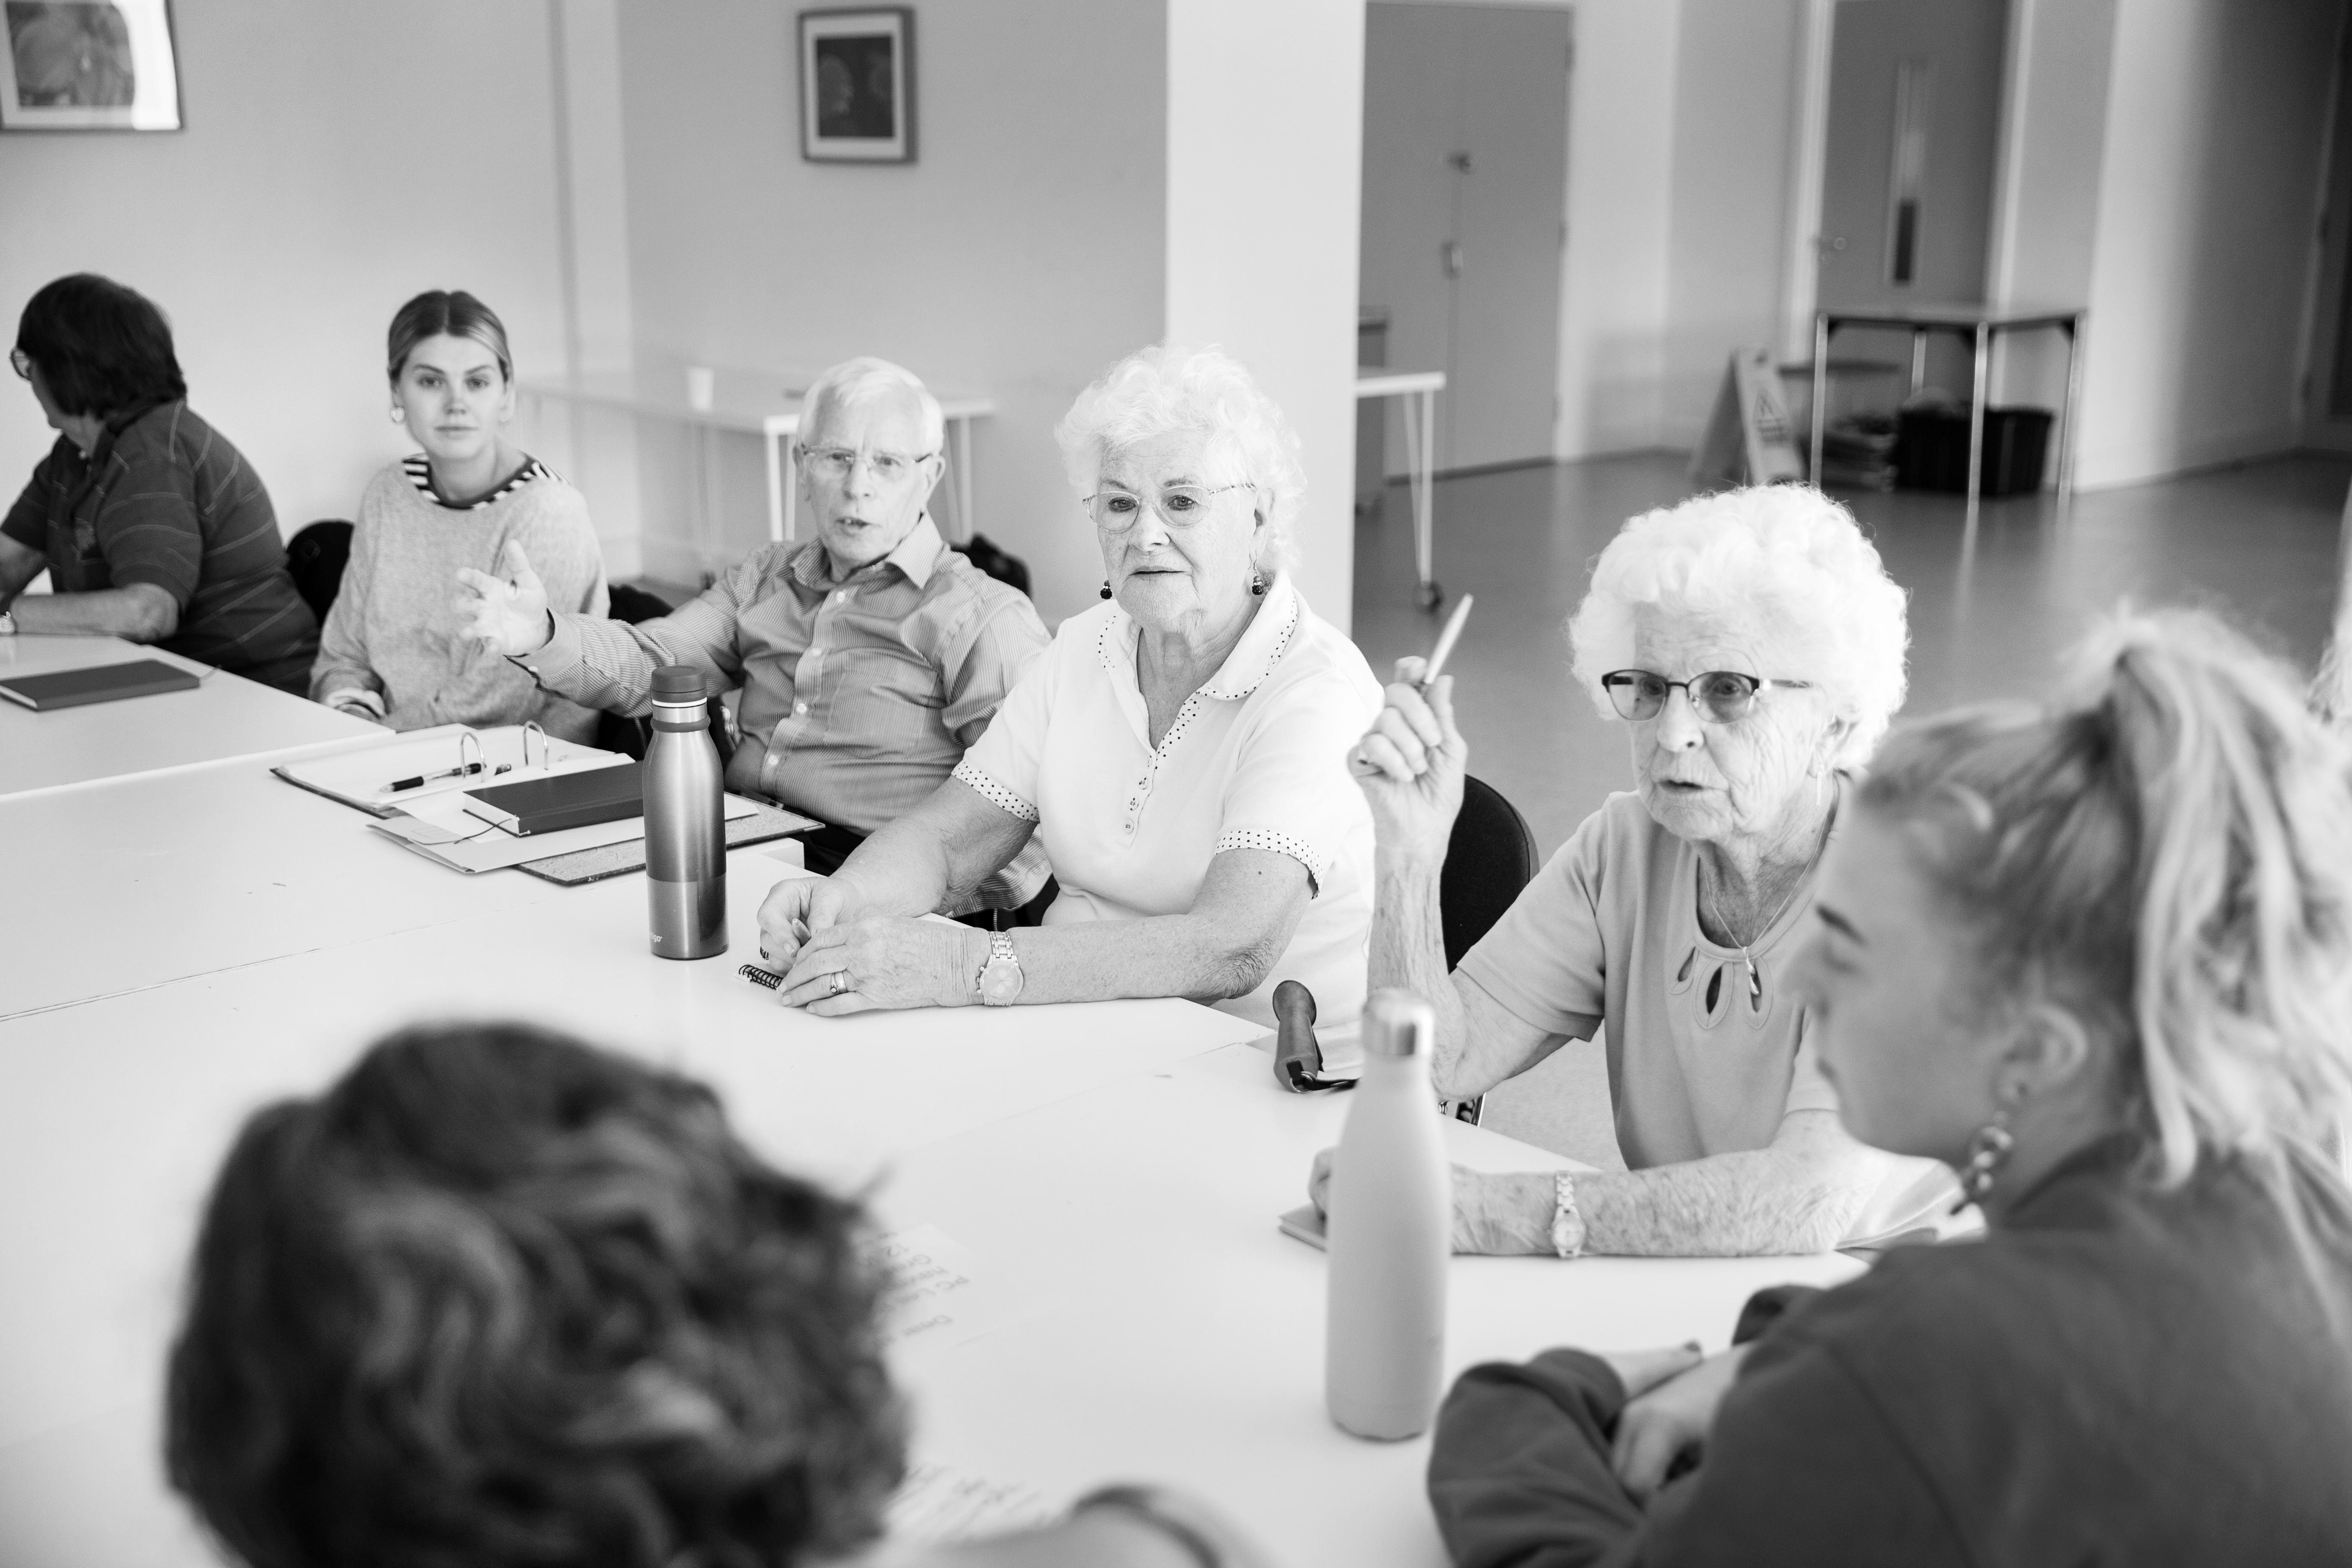 17.09.19 Power To Change; Southmead Development Trust